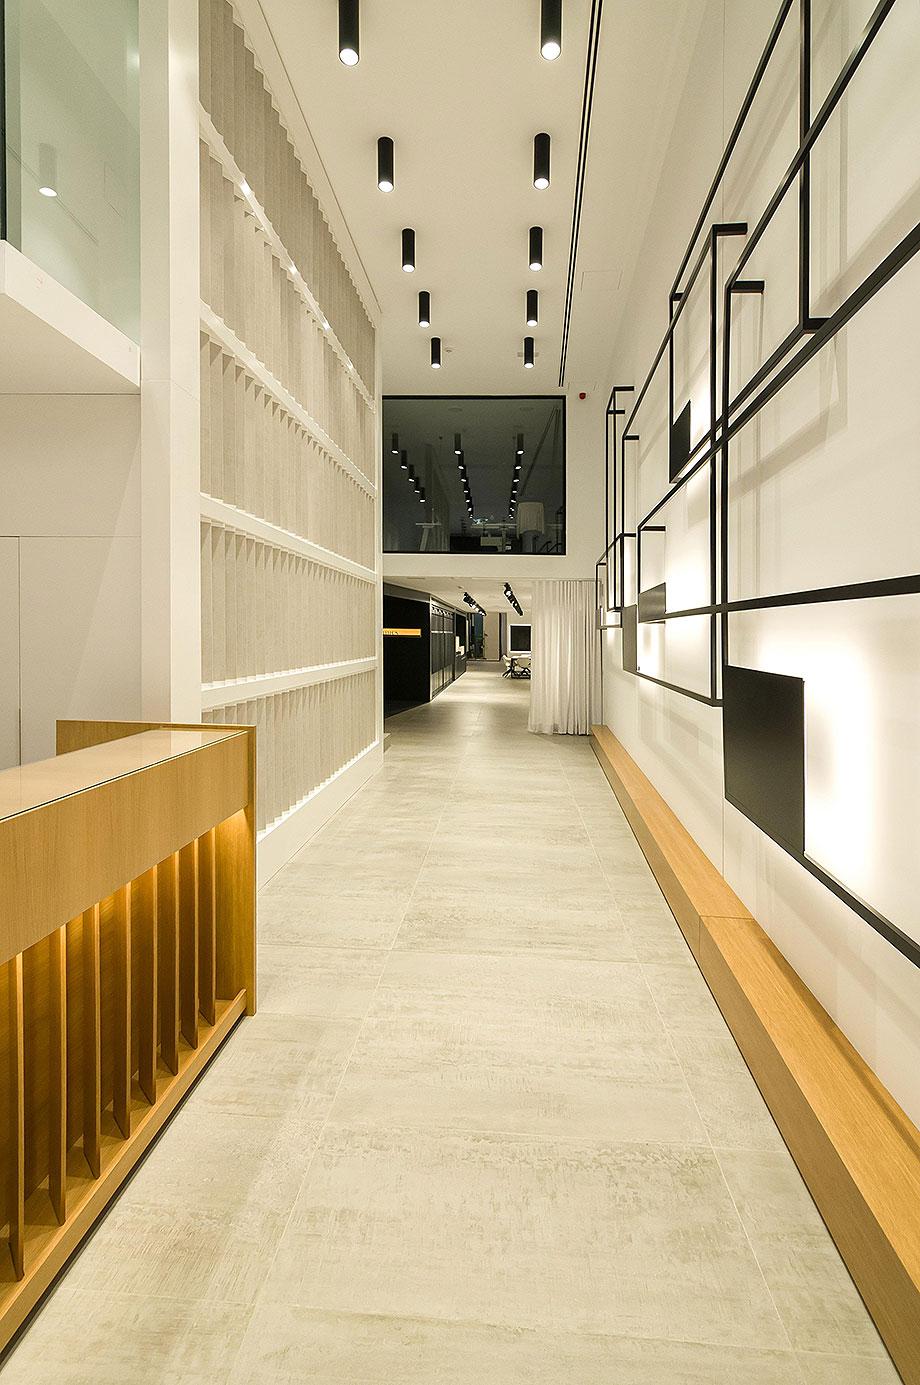 showroom undefasa en alcora de vitale (4) - foto diego suárez (vitale)